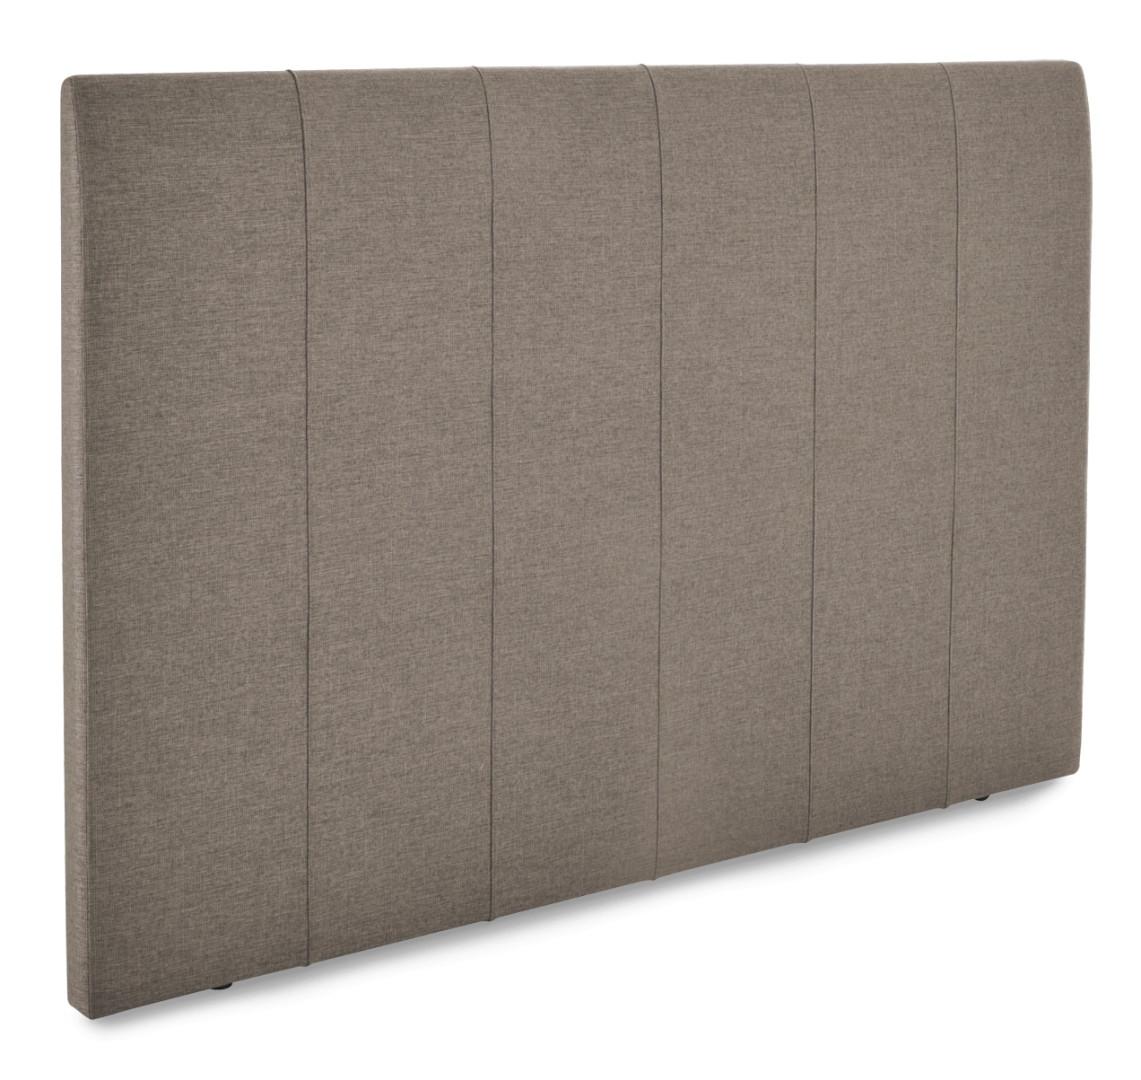 Asko Bonnell CLASSIC-sängynpääty 180 cm